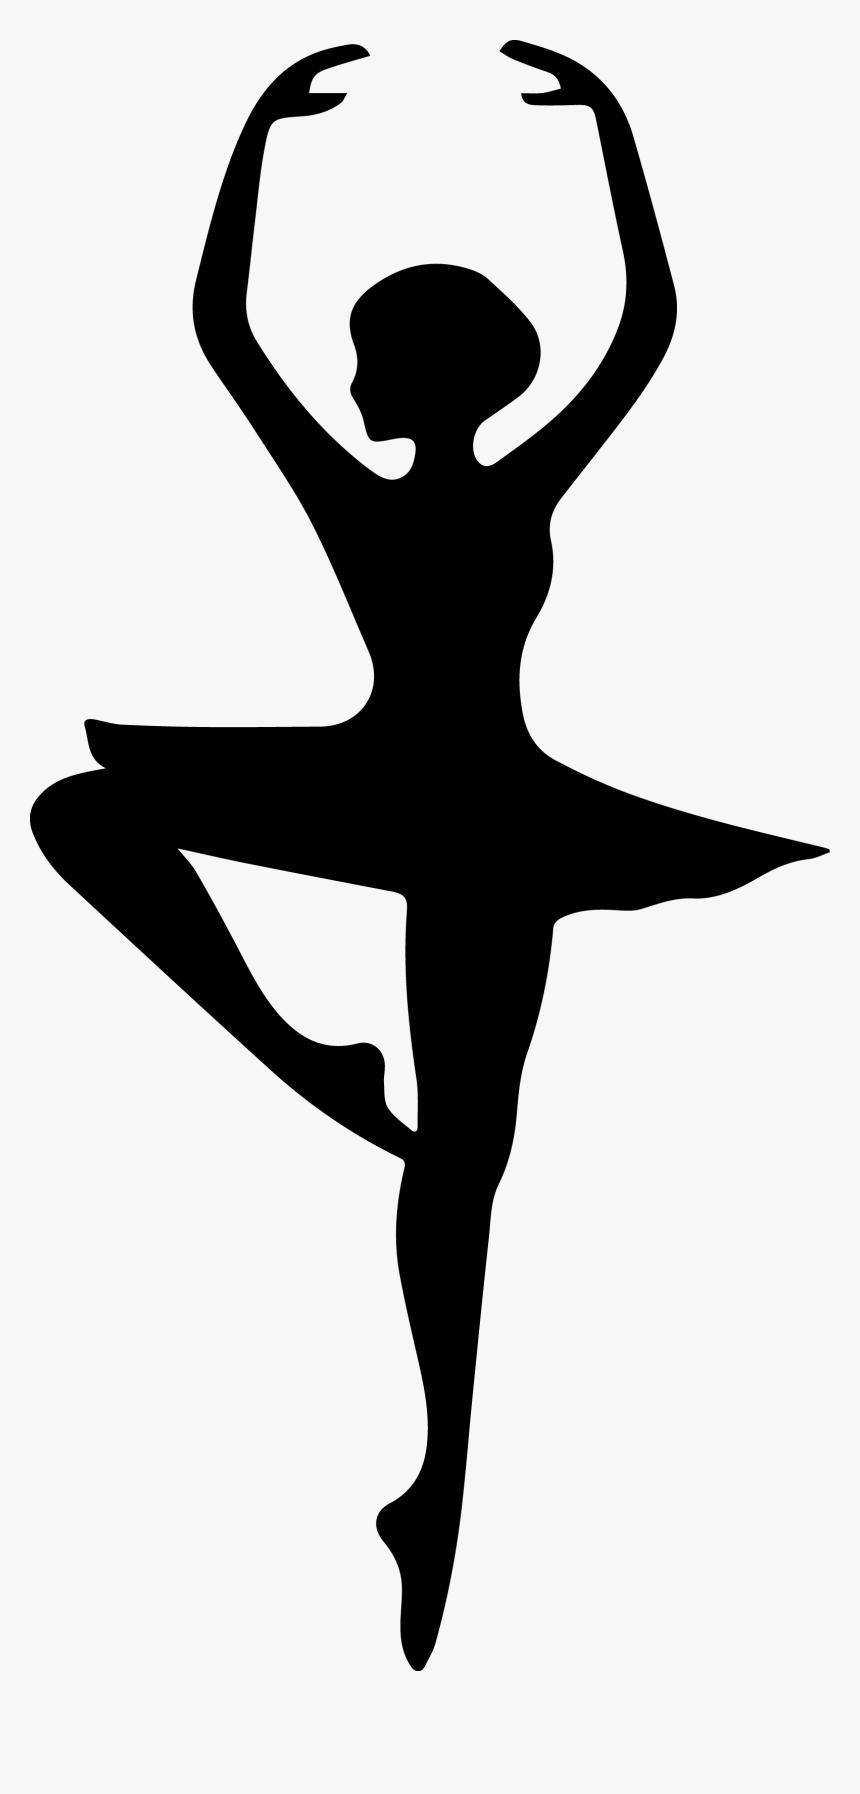 Clip Royalty Free Download Ballet Clipart Ballet Studio Ballerina Clipart Black And White Hd Png Download Transparent Png Image Pngitem